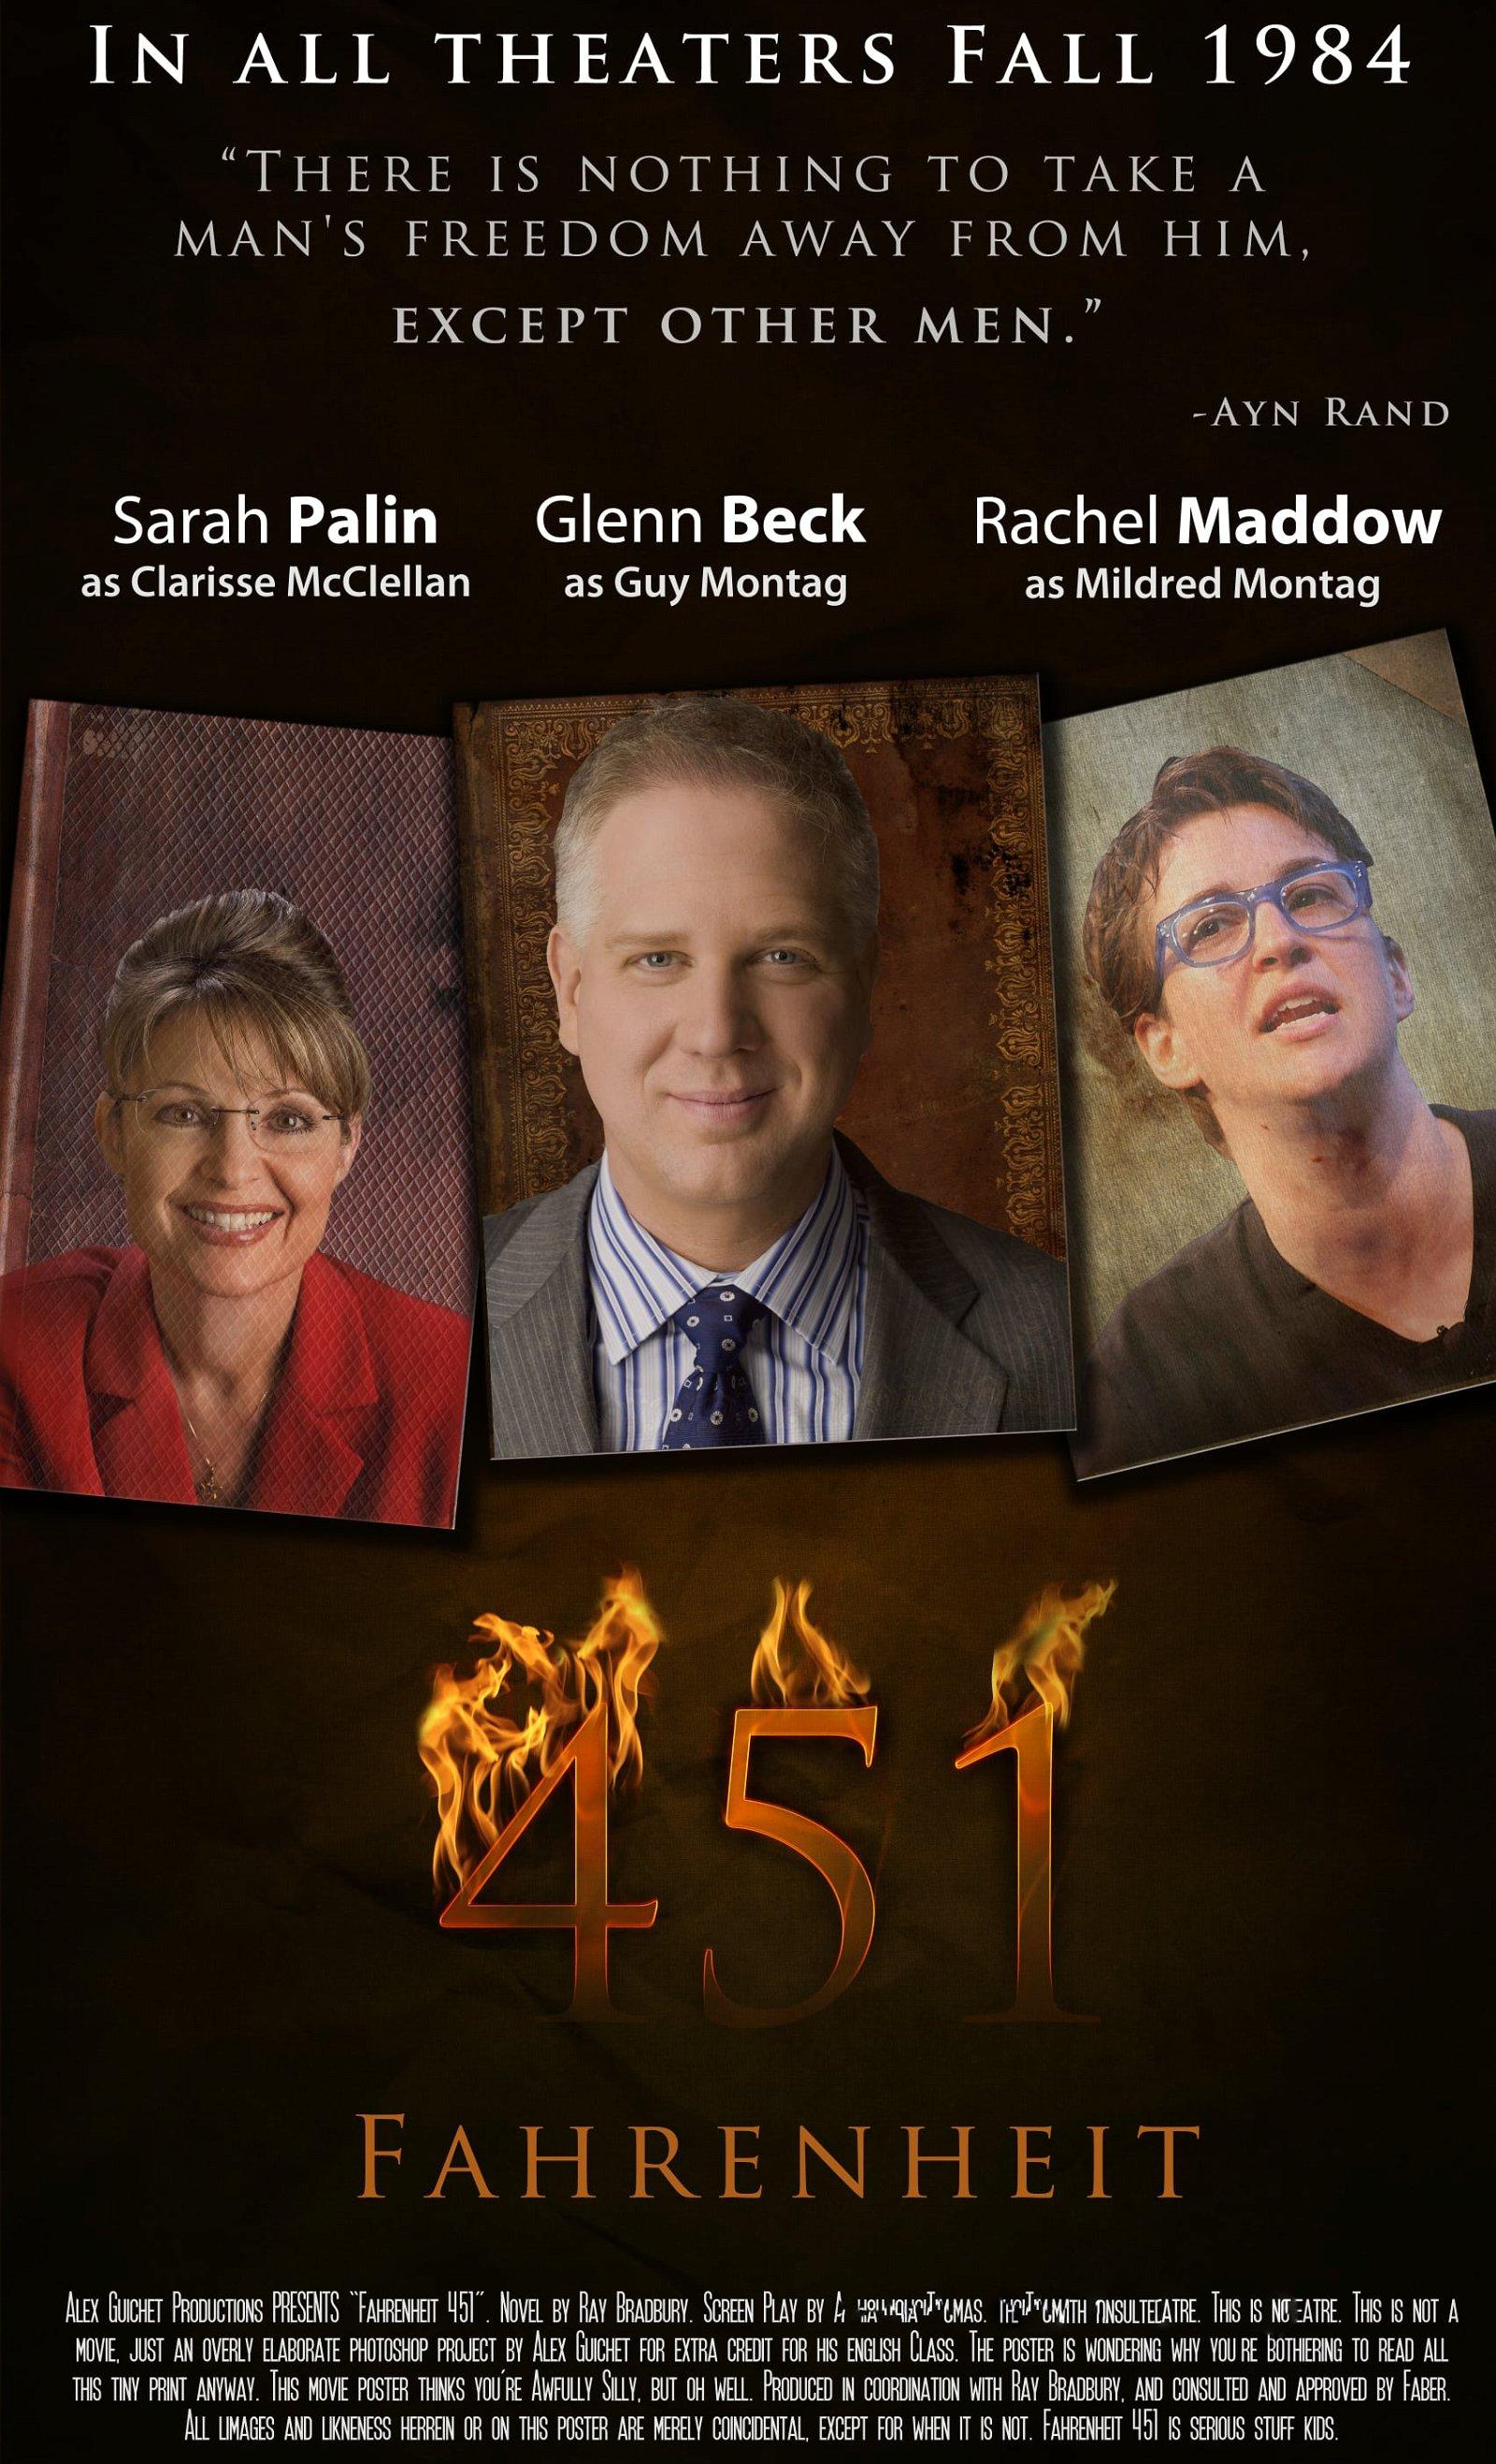 Fahrenheit 451: A fake movie poster, for a fake movie.